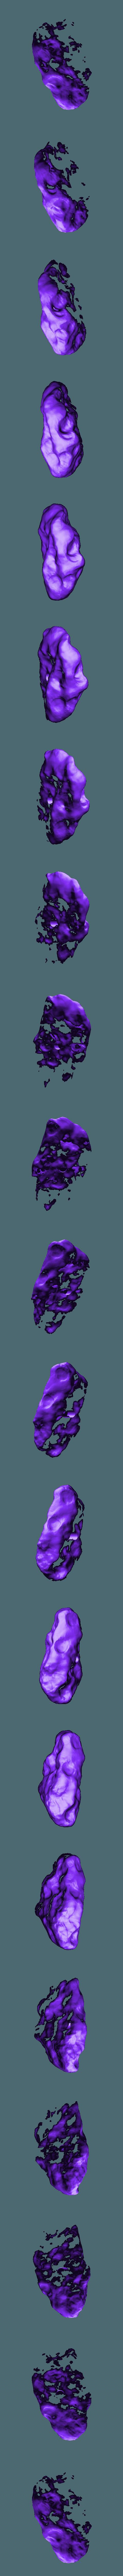 medium.stl Download free STL file The Space Set • 3D print design, HeribertoValle